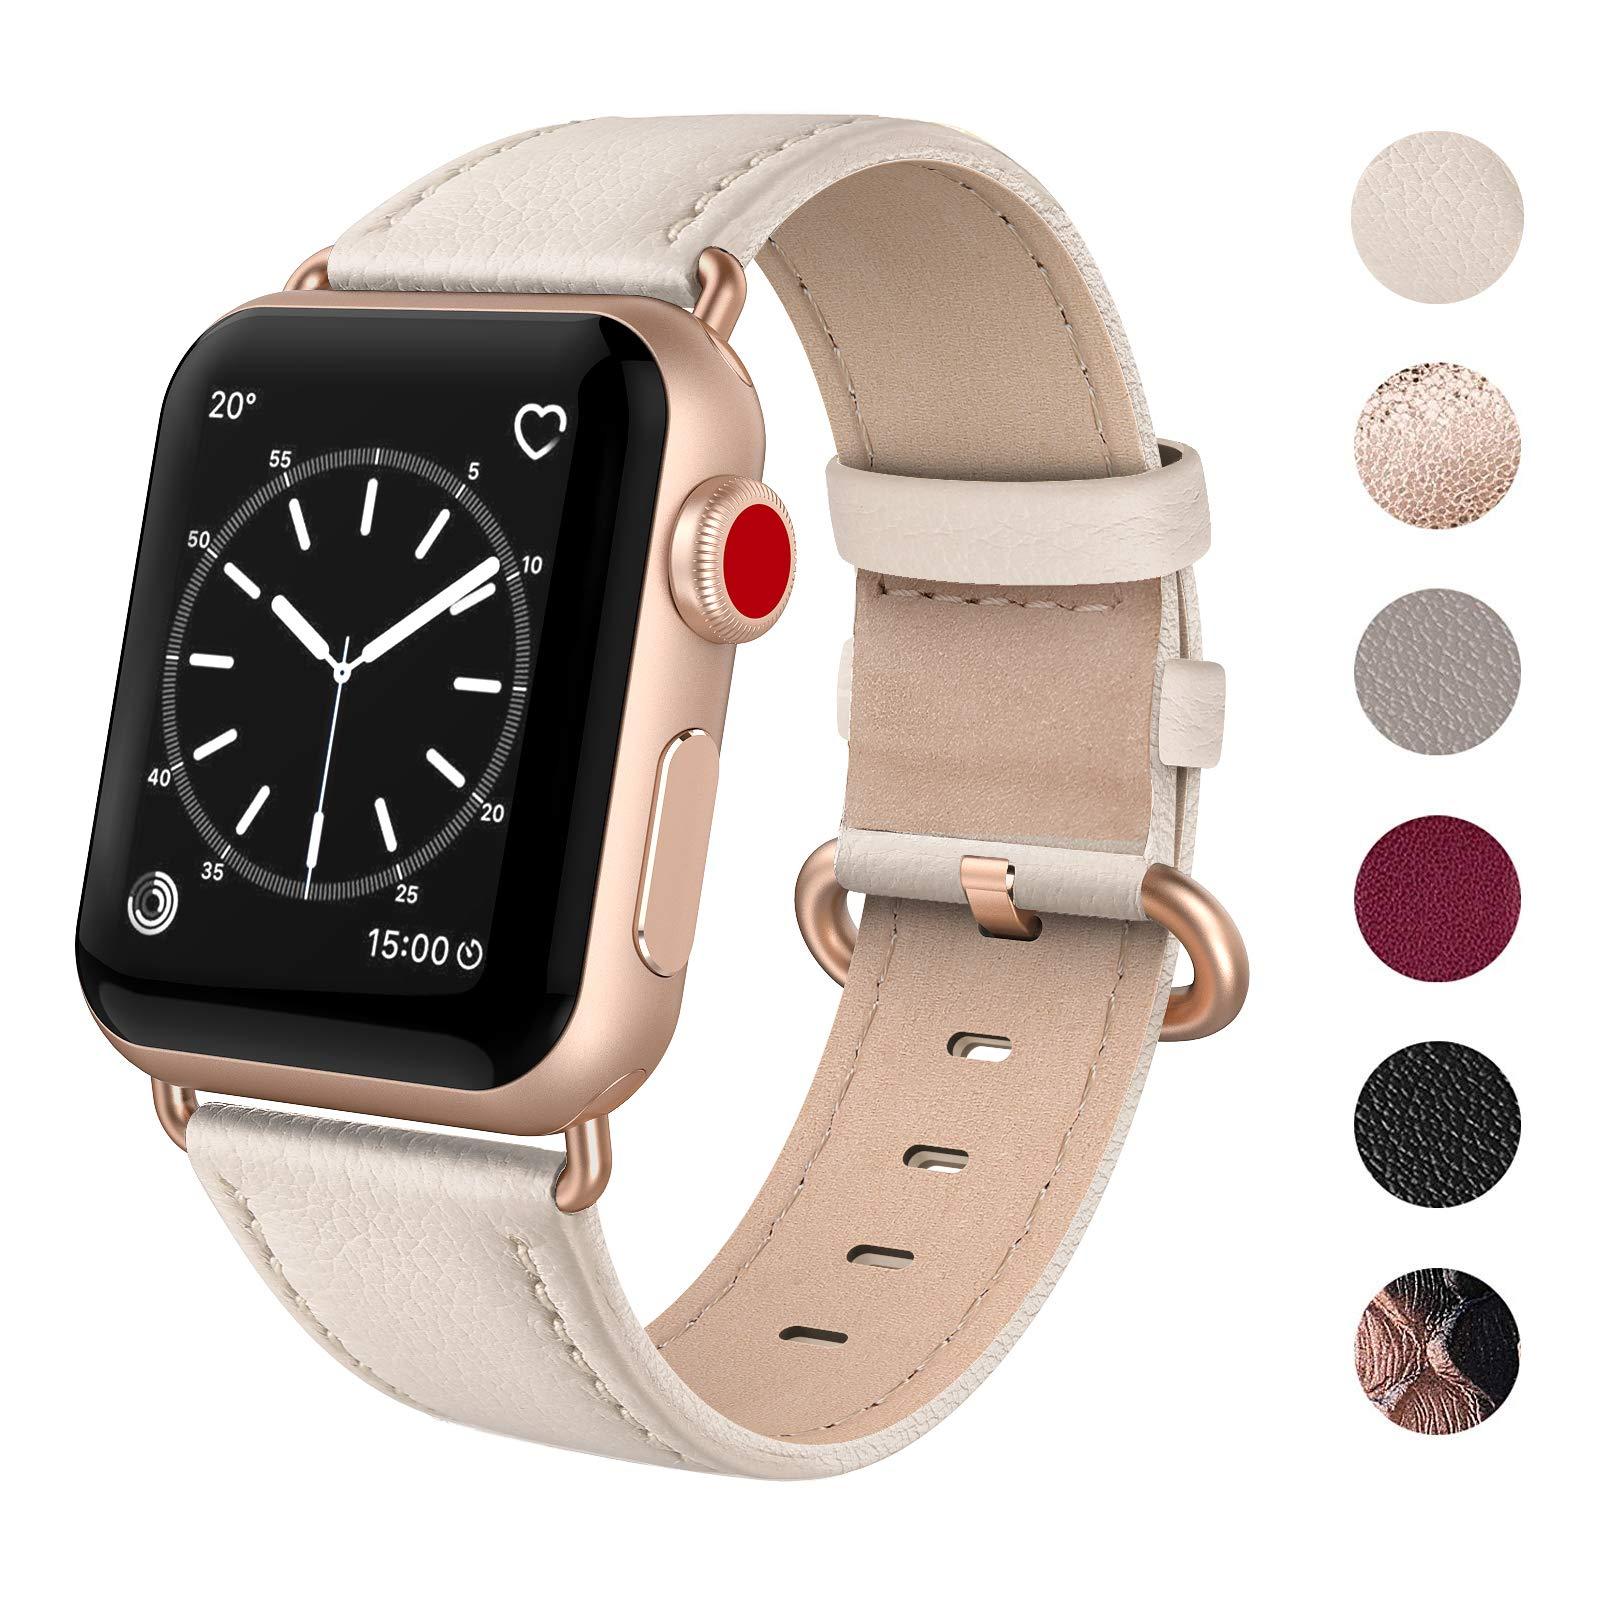 Malla Cuero para Apple Watch (38/40mm) SWEES [7FQJ5D8K]